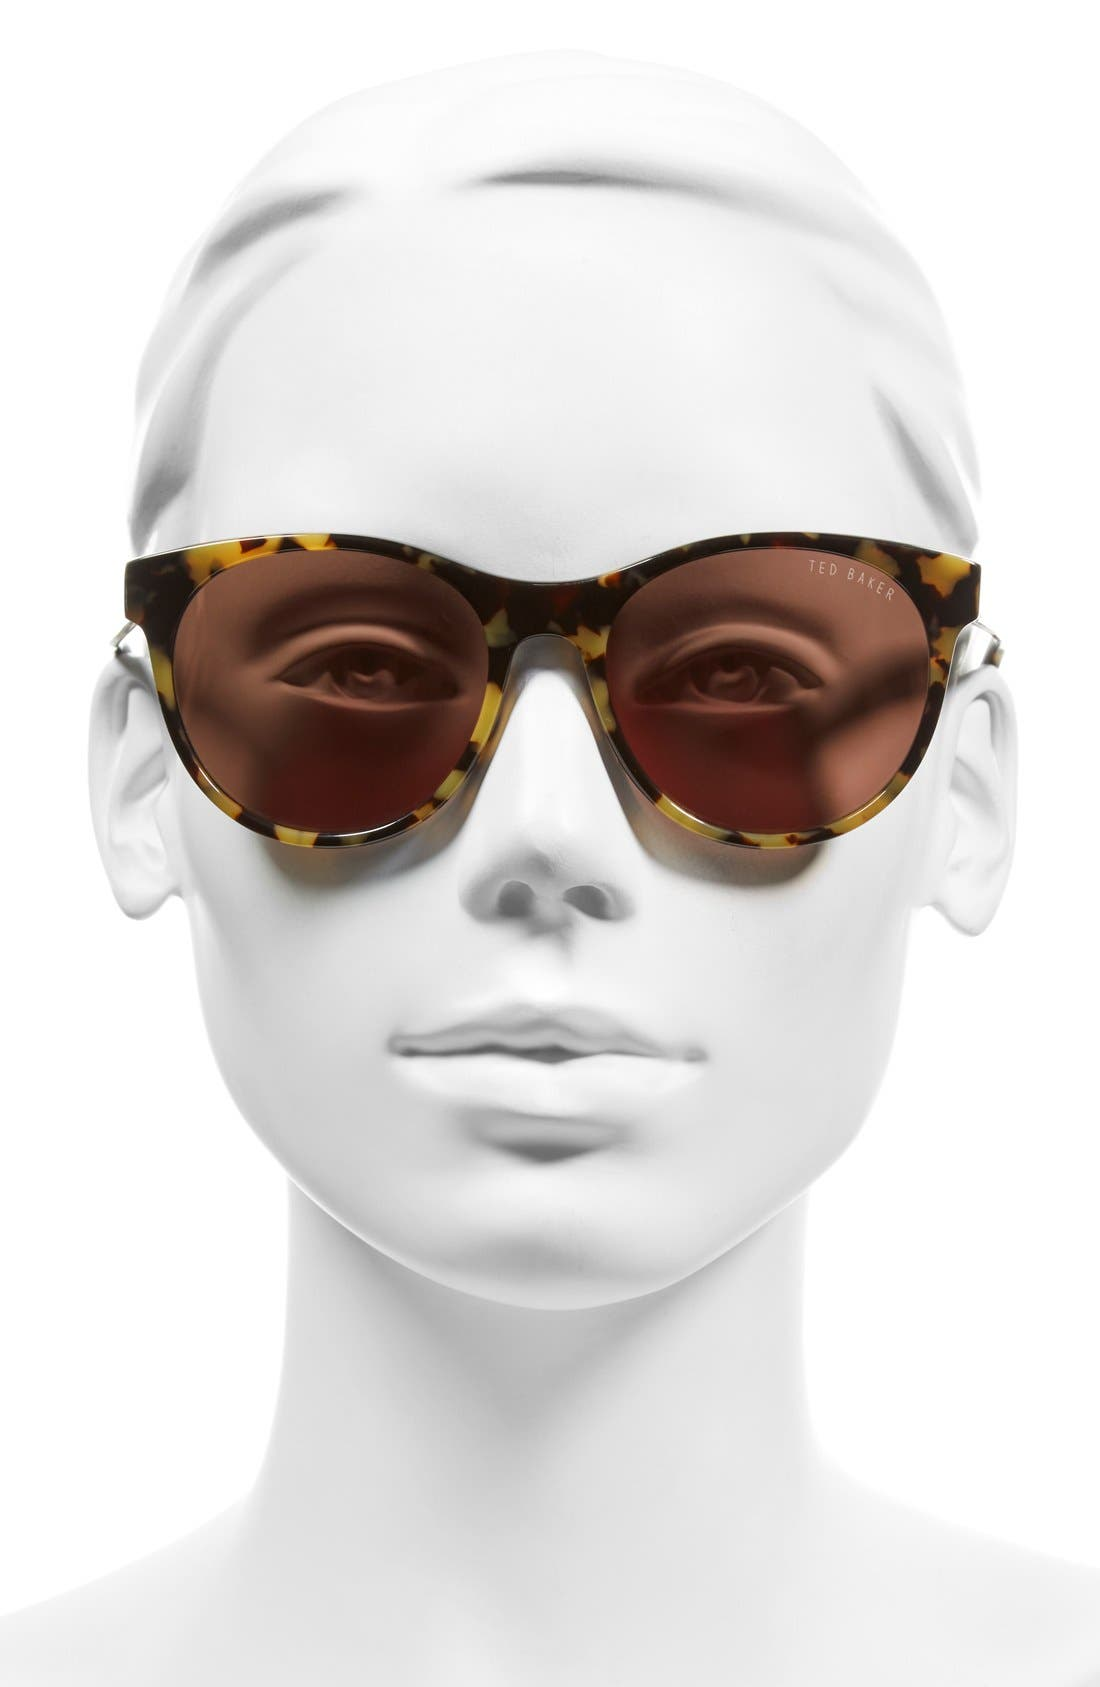 54mm Retro Sunglasses,                             Alternate thumbnail 2, color,                             201